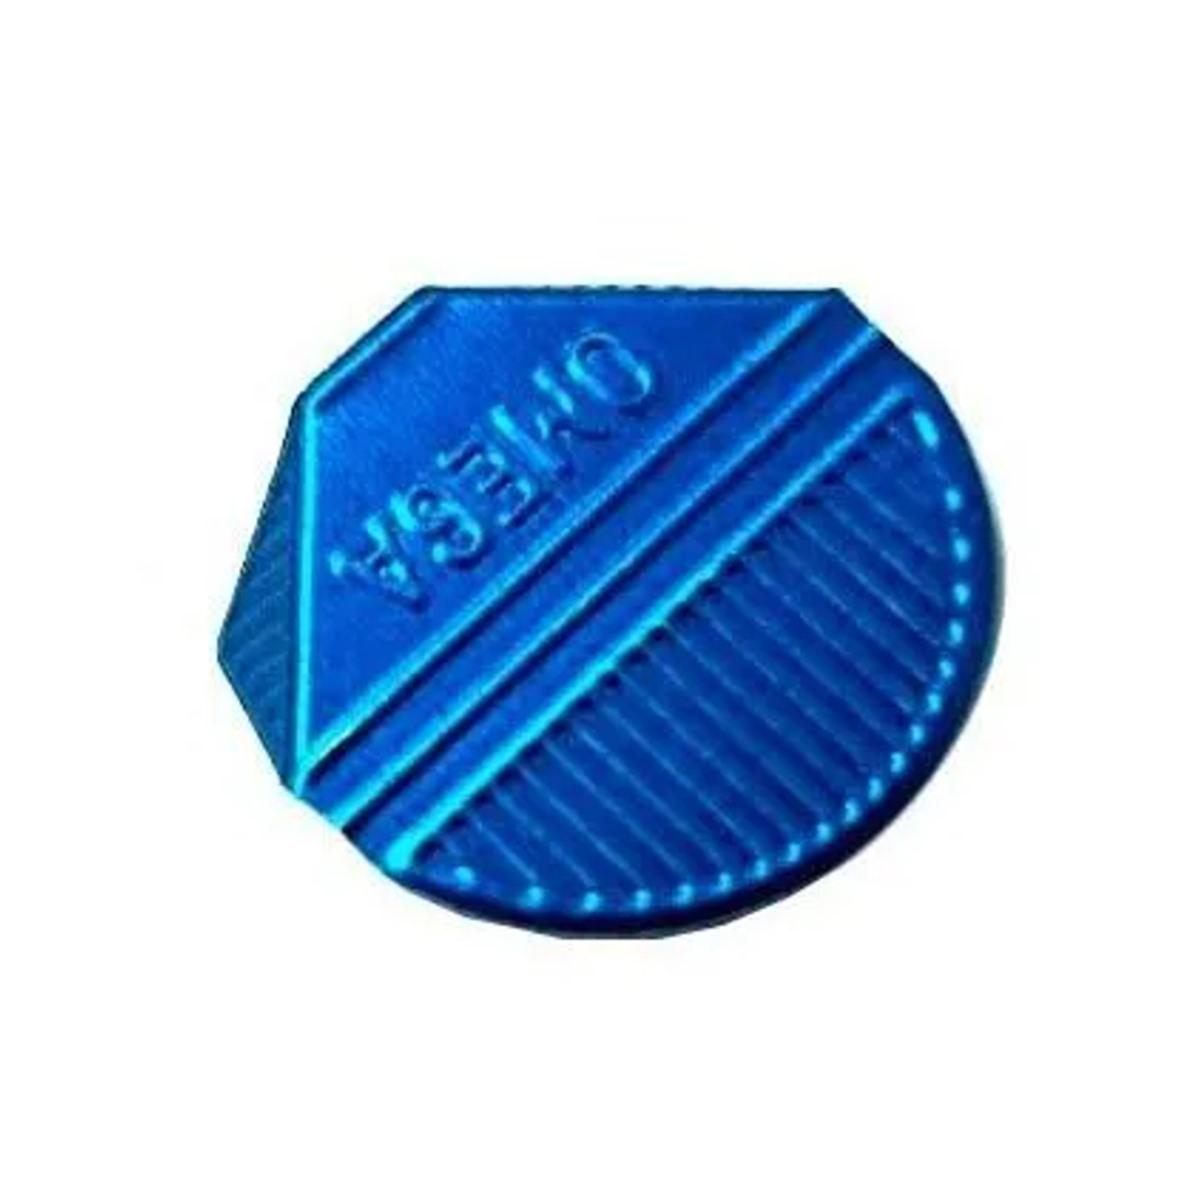 Prendedor de  Papel Presclip Omega - Caixa 1000 Unds Azul